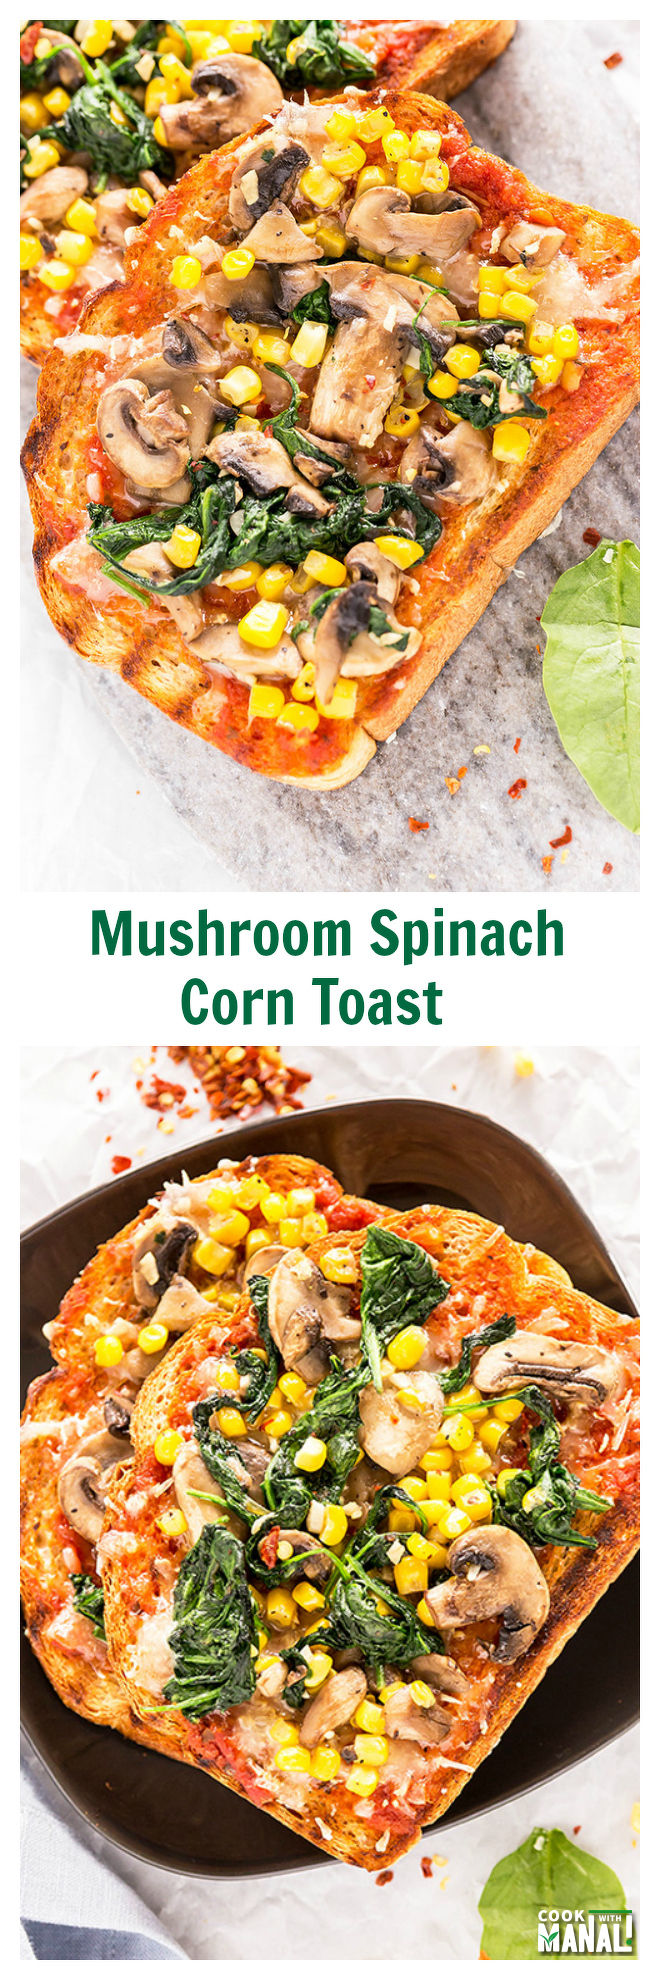 Mushroom Spinach Corn Toast-Collage